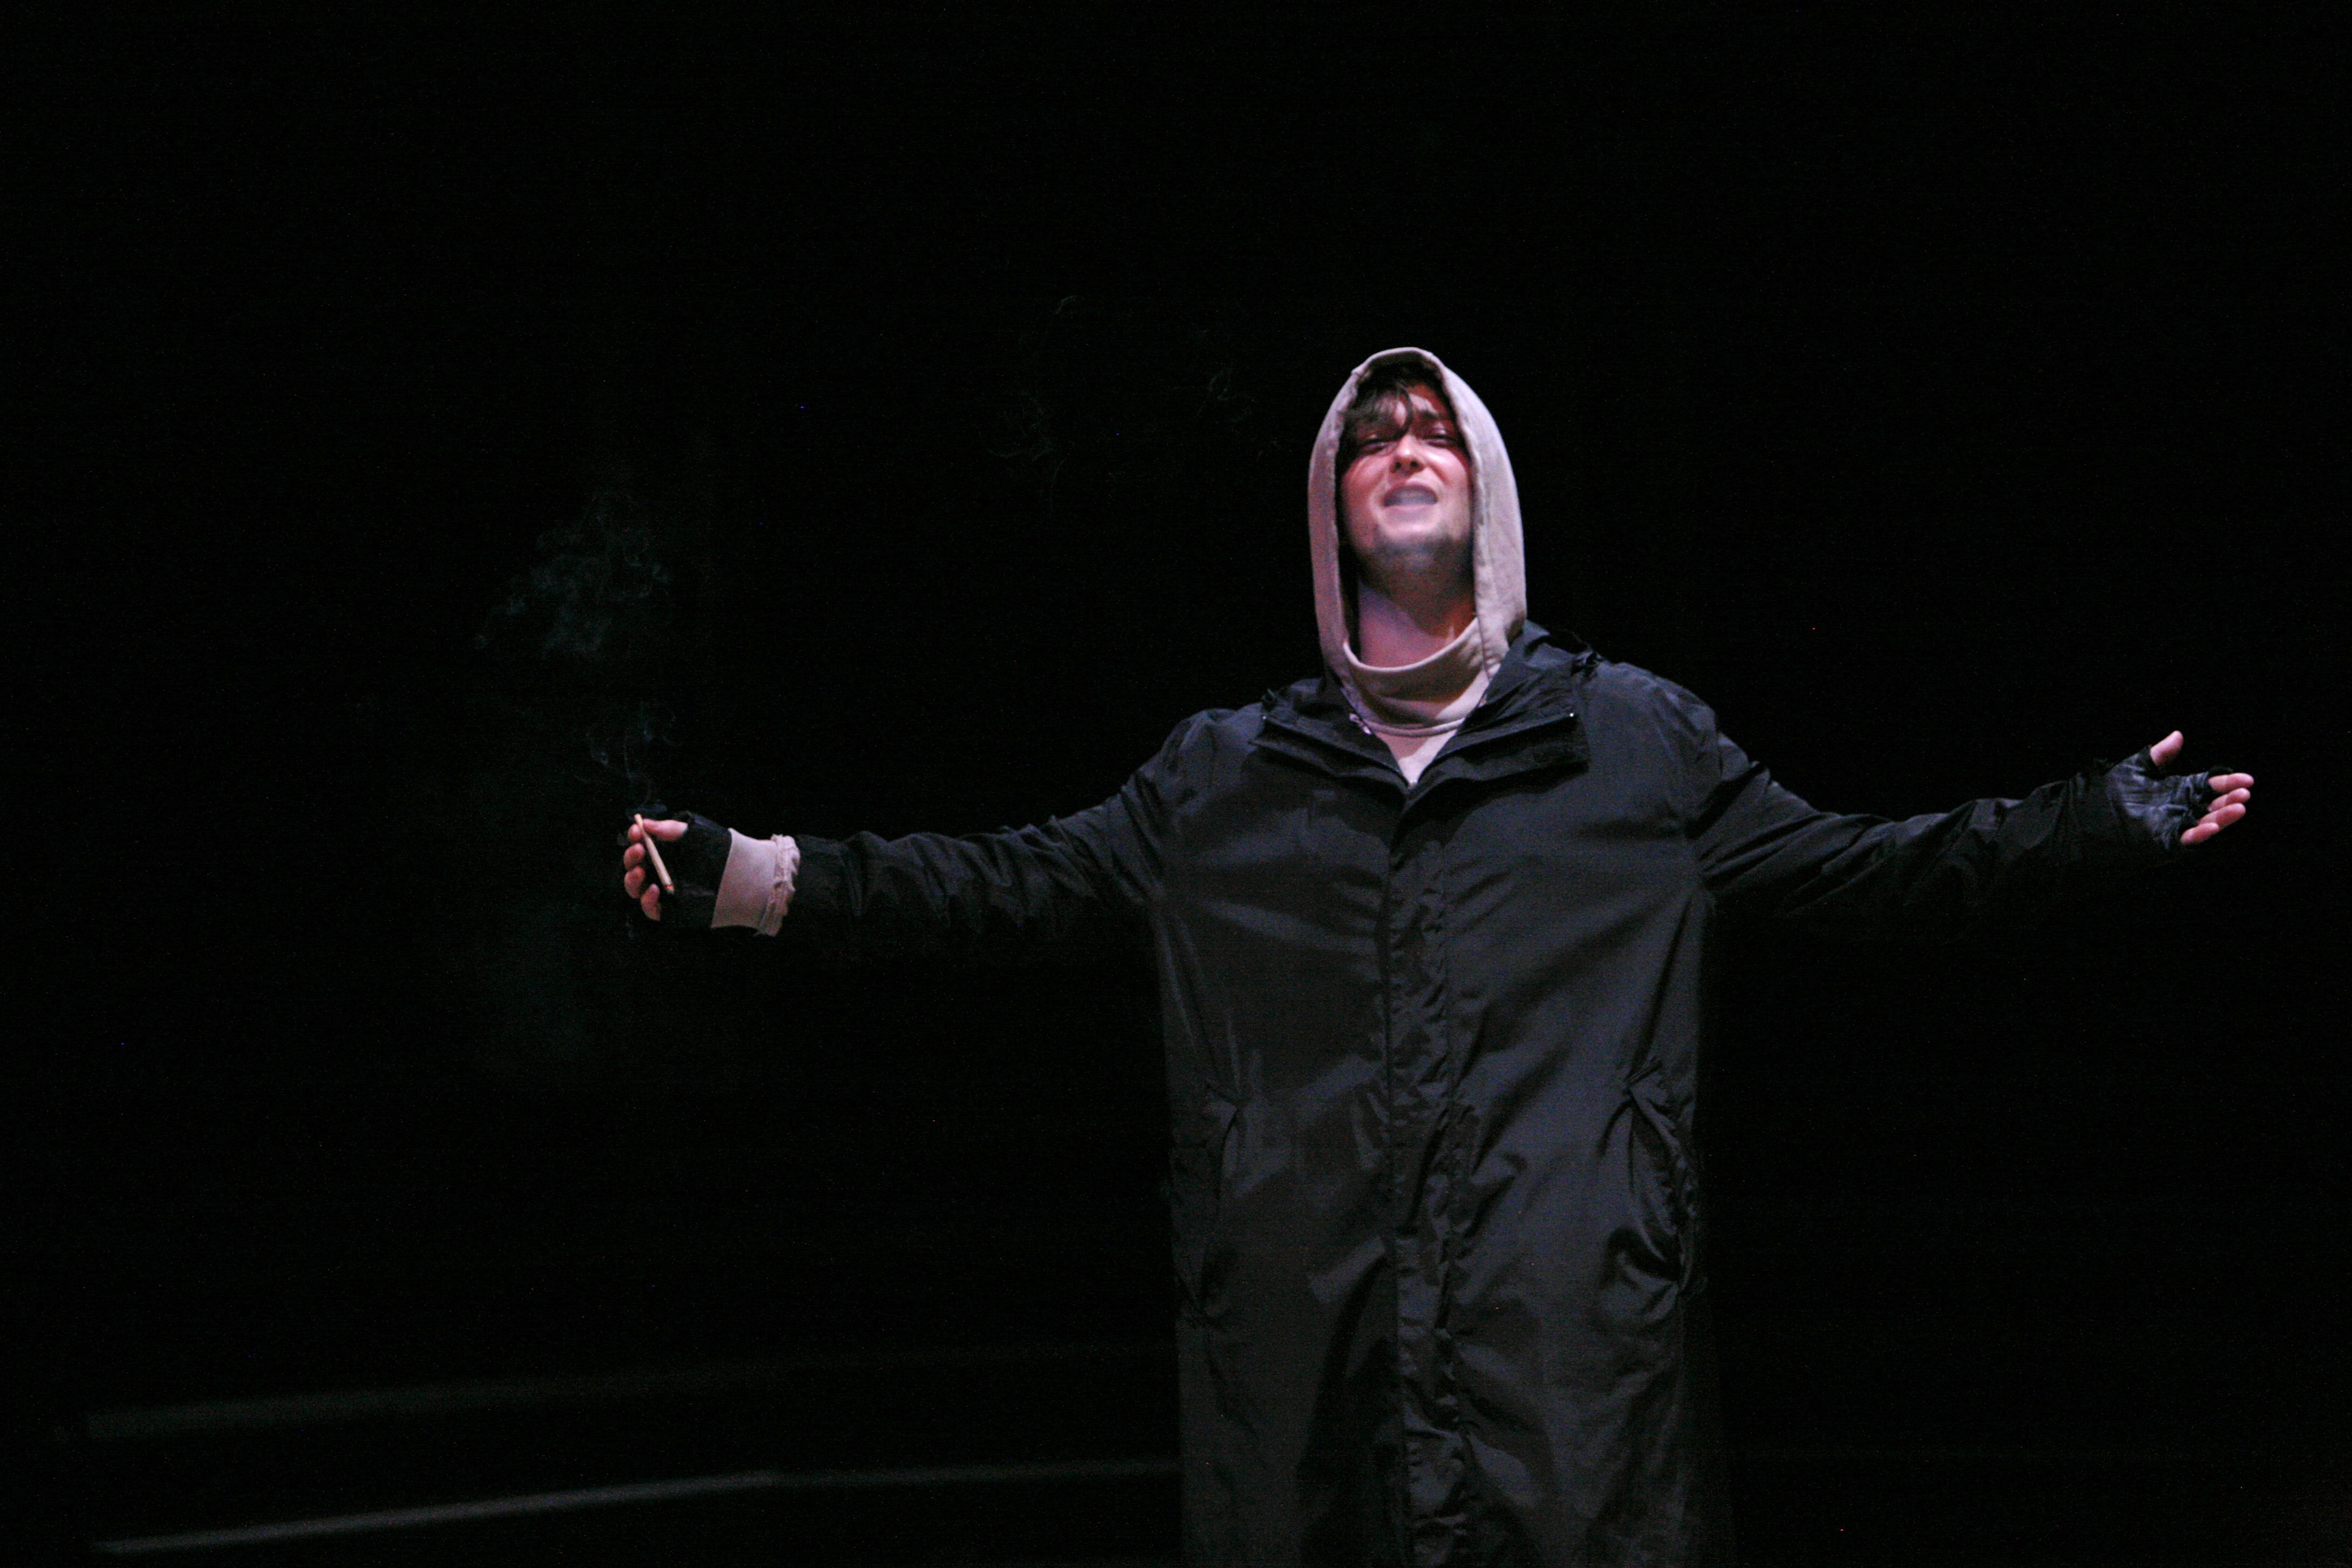 George Caple in Romeo & Juliet, photo by Gary Calton GC270517009 #